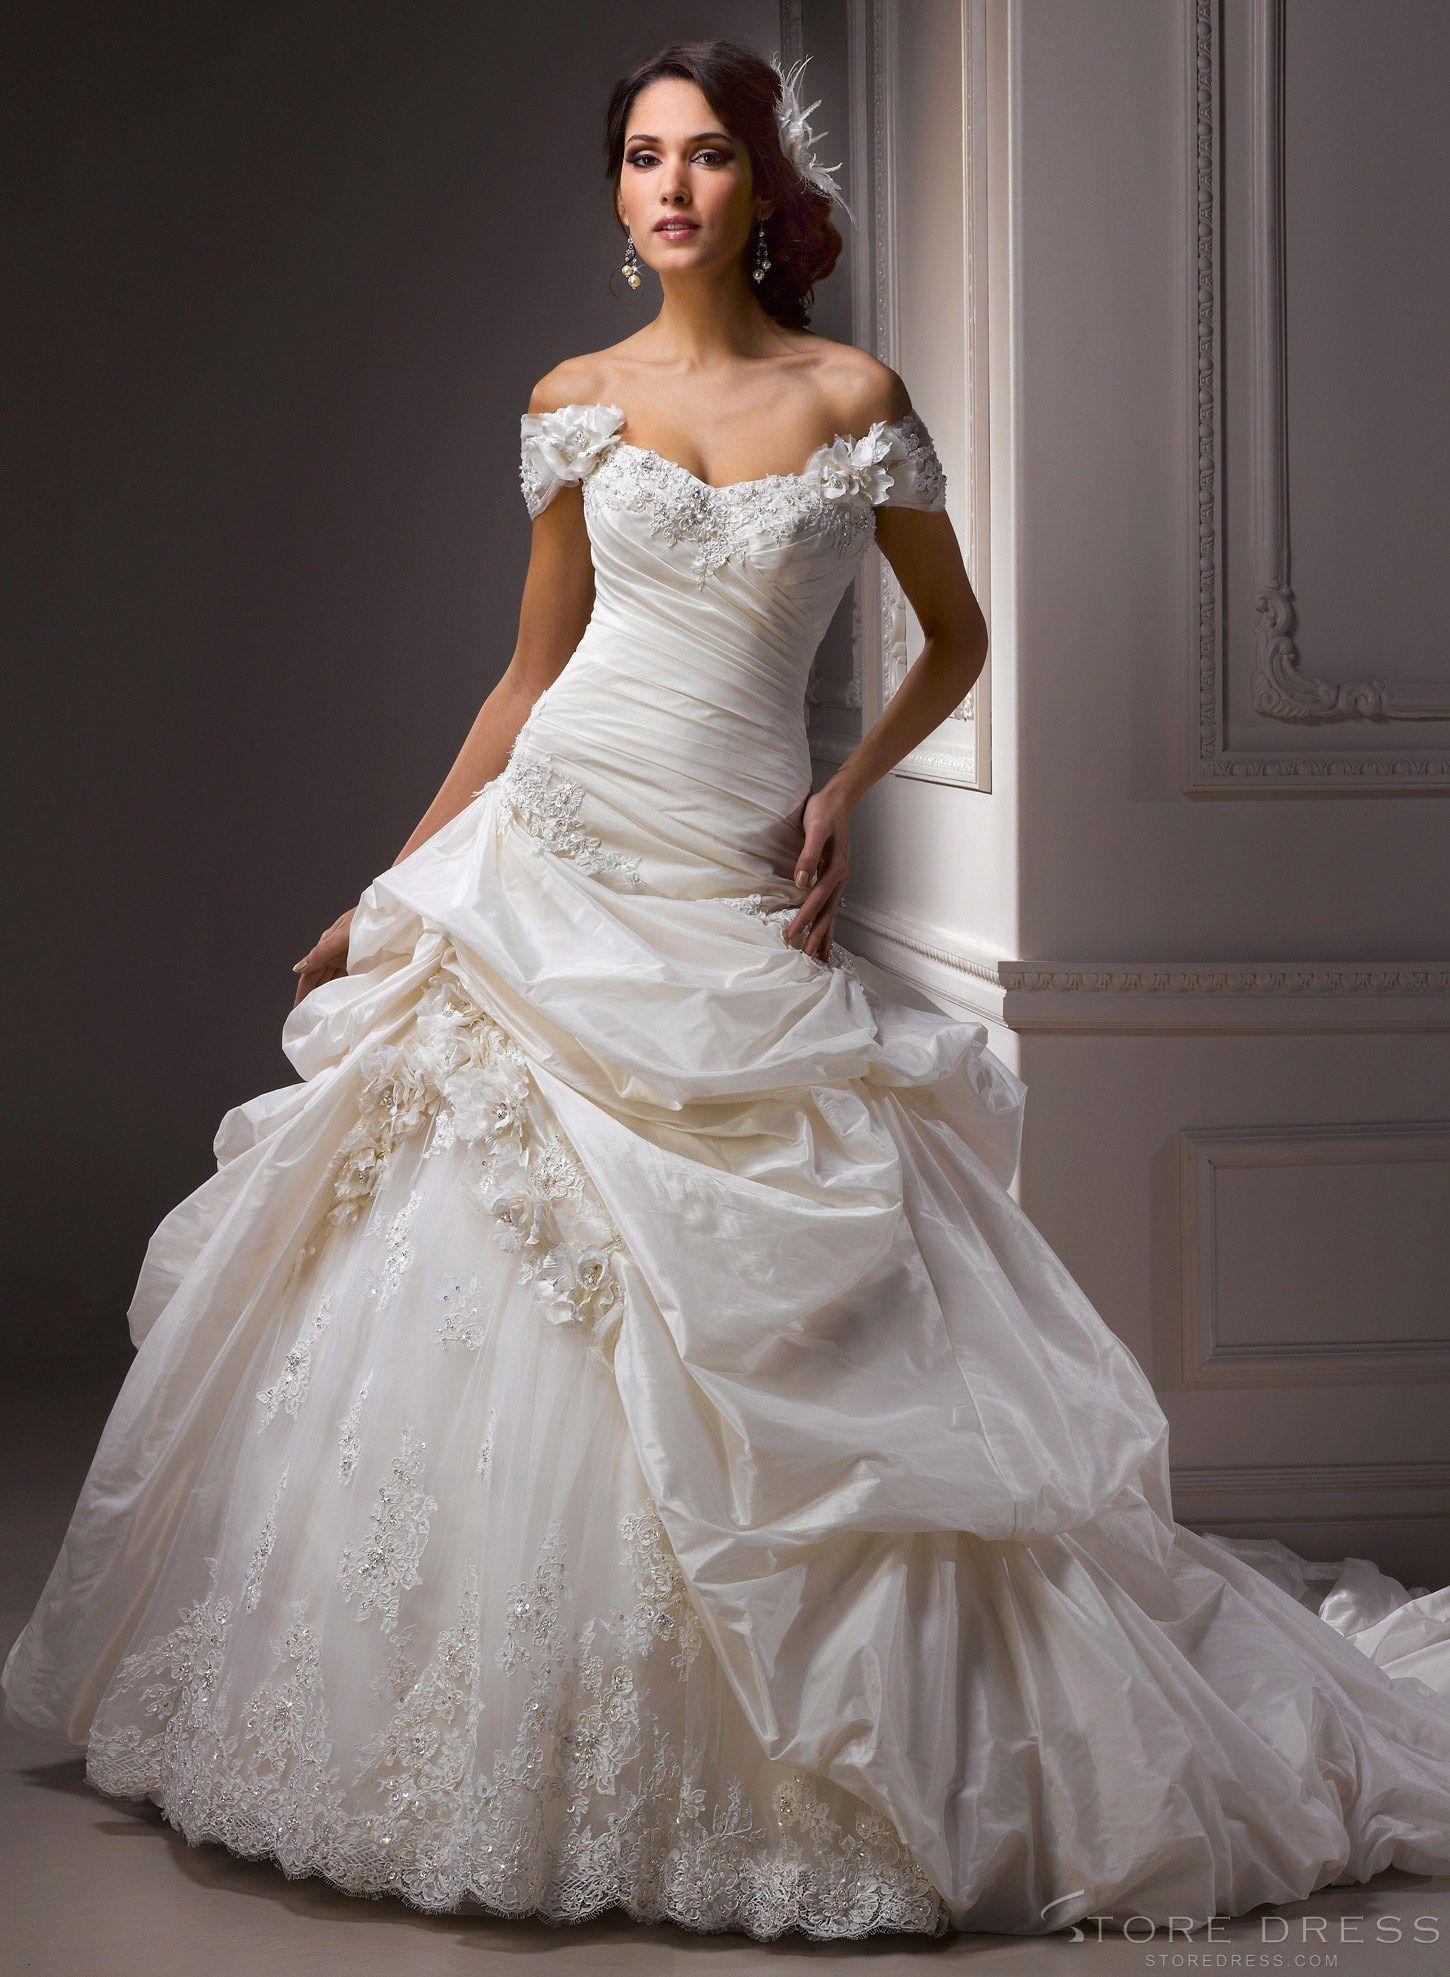 Detachable skirt wedding dress  Magnetic Ball Gown Sweetheart Appliques Pick Up Skirt Taffeta